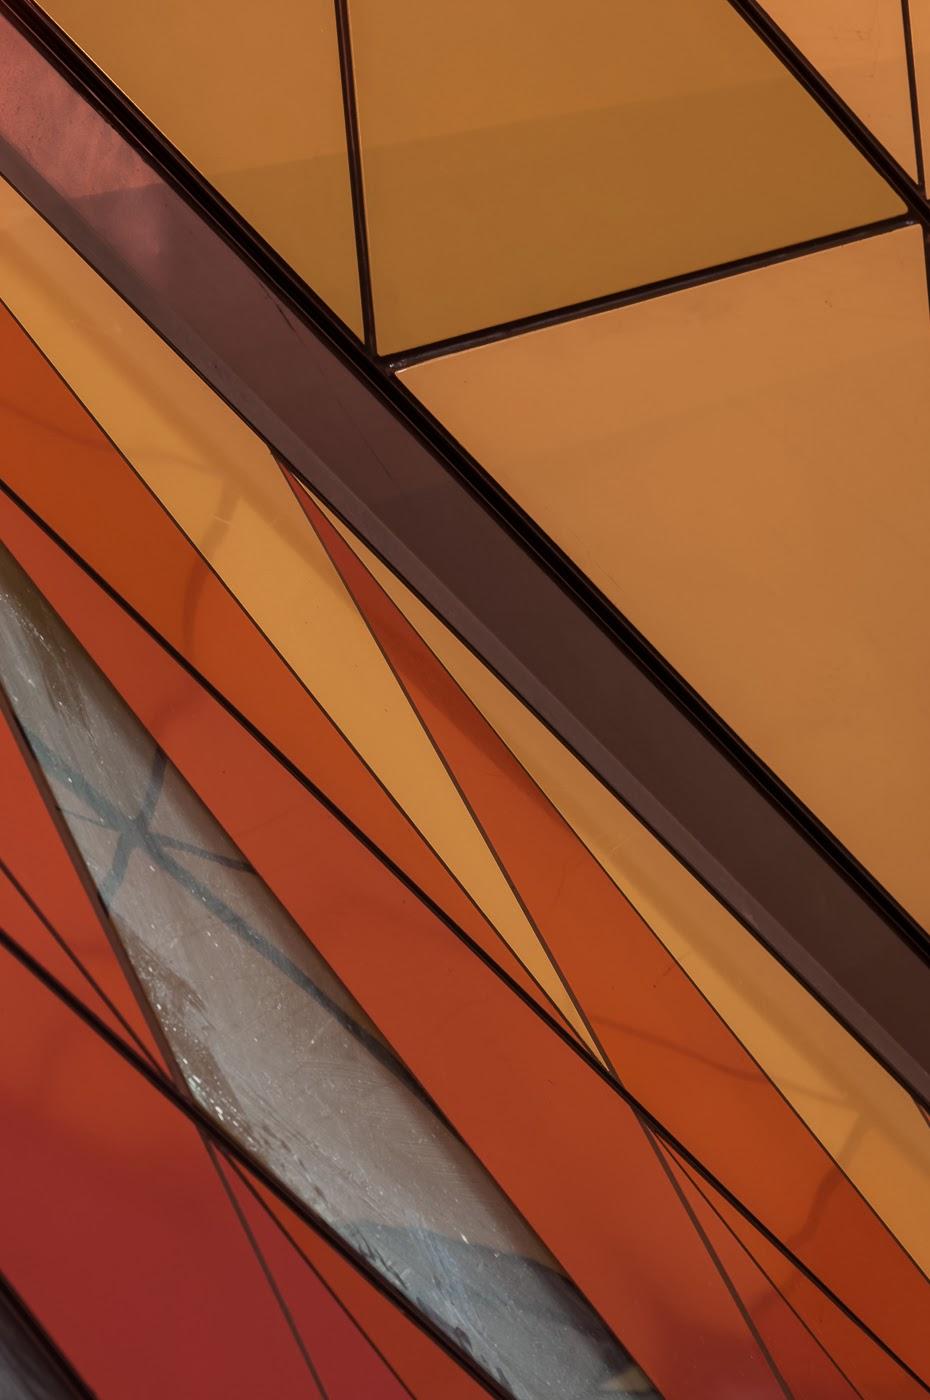 Melbourne, Australia, corporation, architecture, architectural, architects, abstract, abstractional, abstraction tim macauley, detail, steel, structure, photographic artist, woods bagot, nab, docklands, bourke st